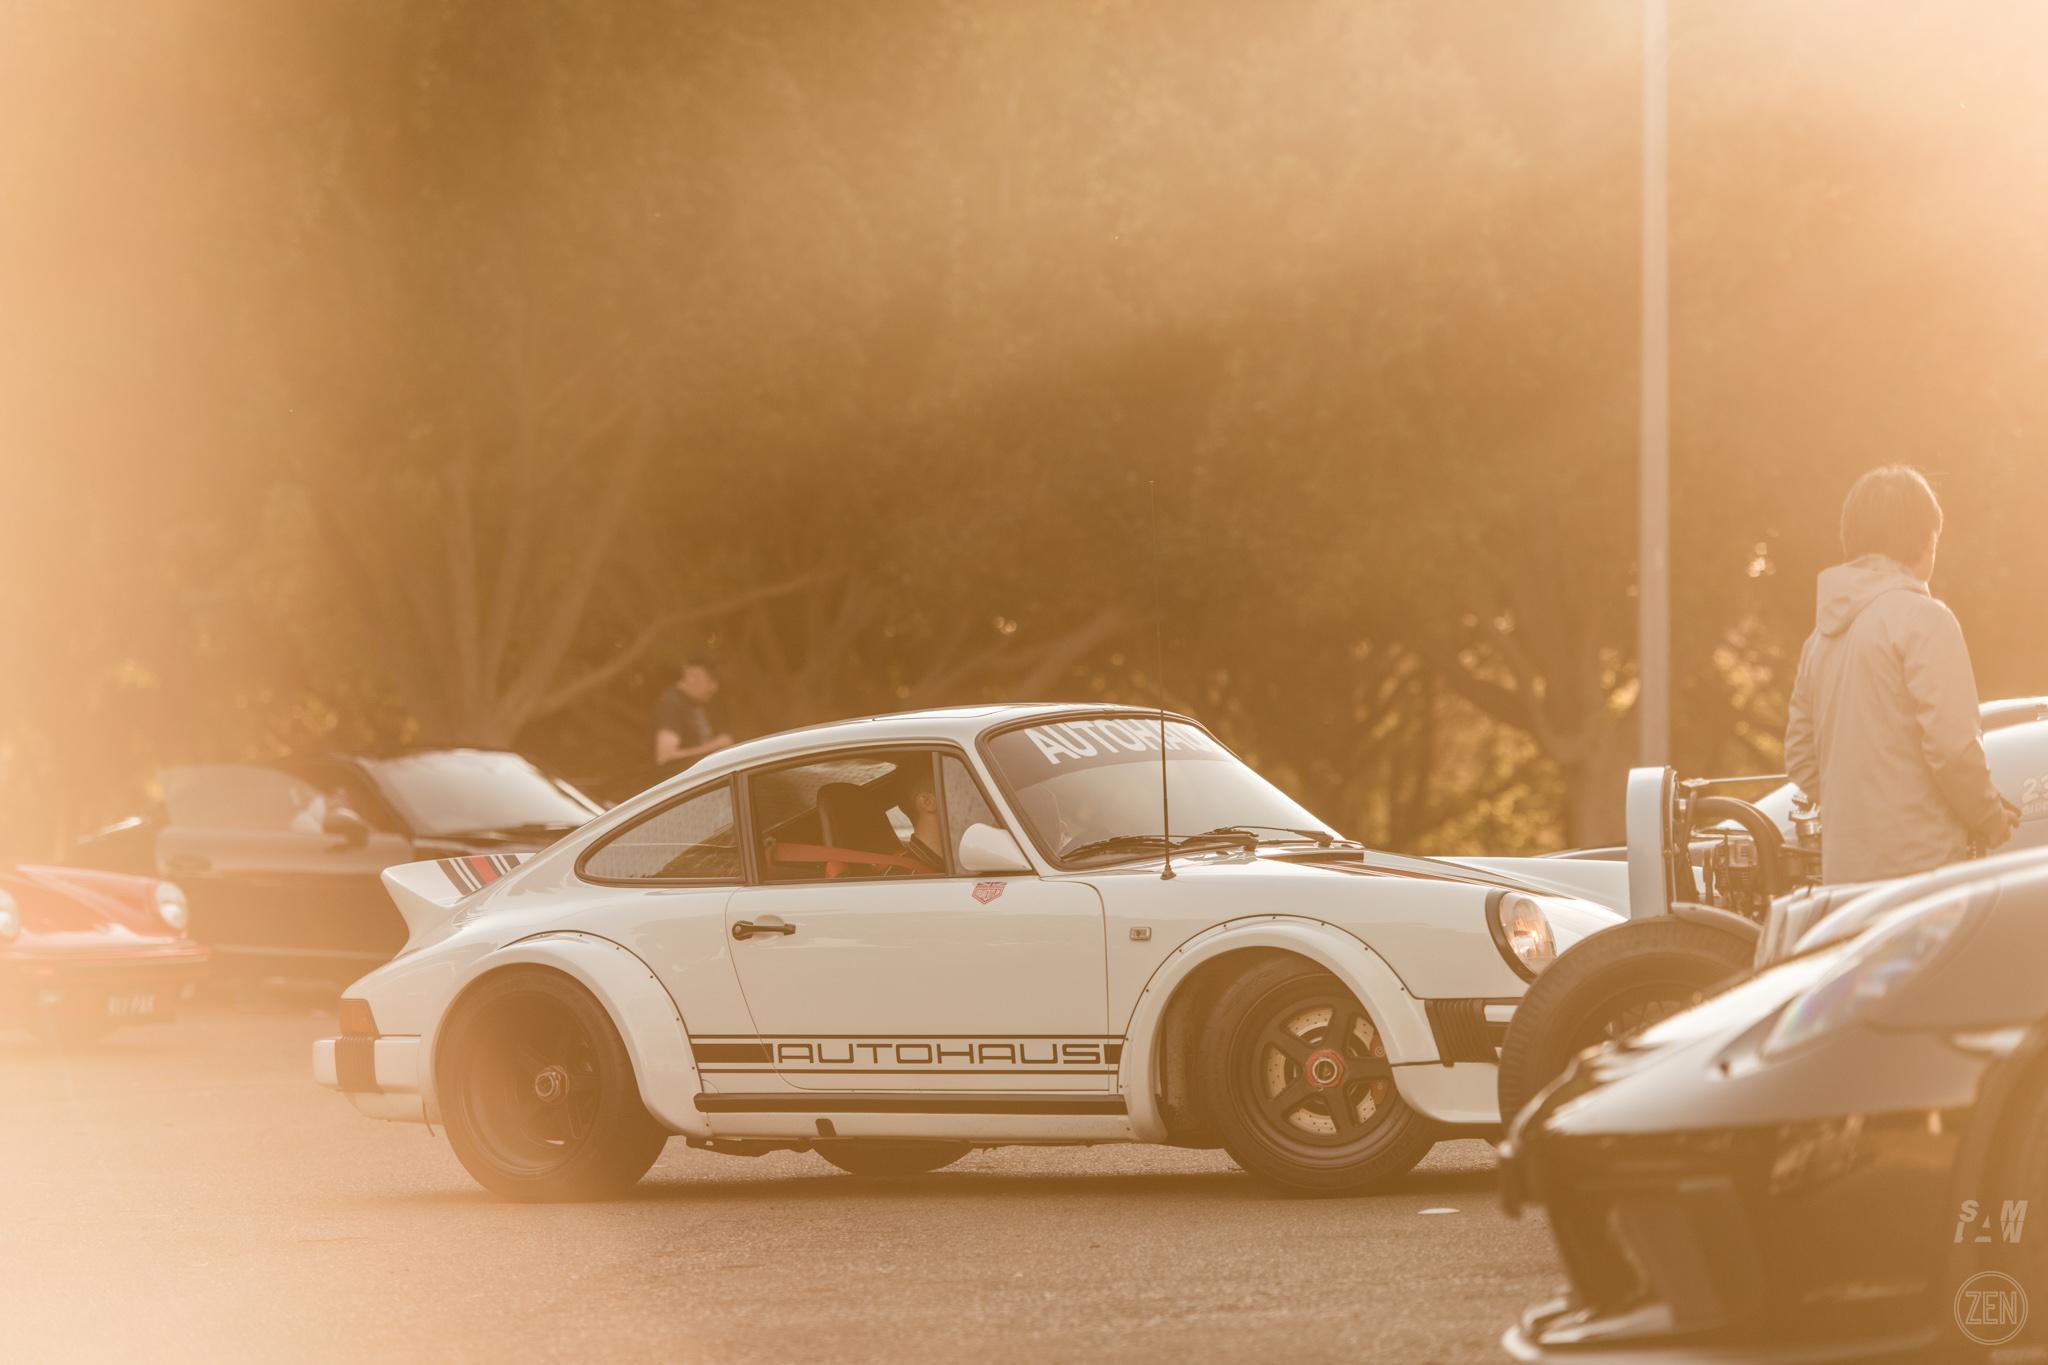 2019-10-27 - Autohaus Porsches & Coffee 032